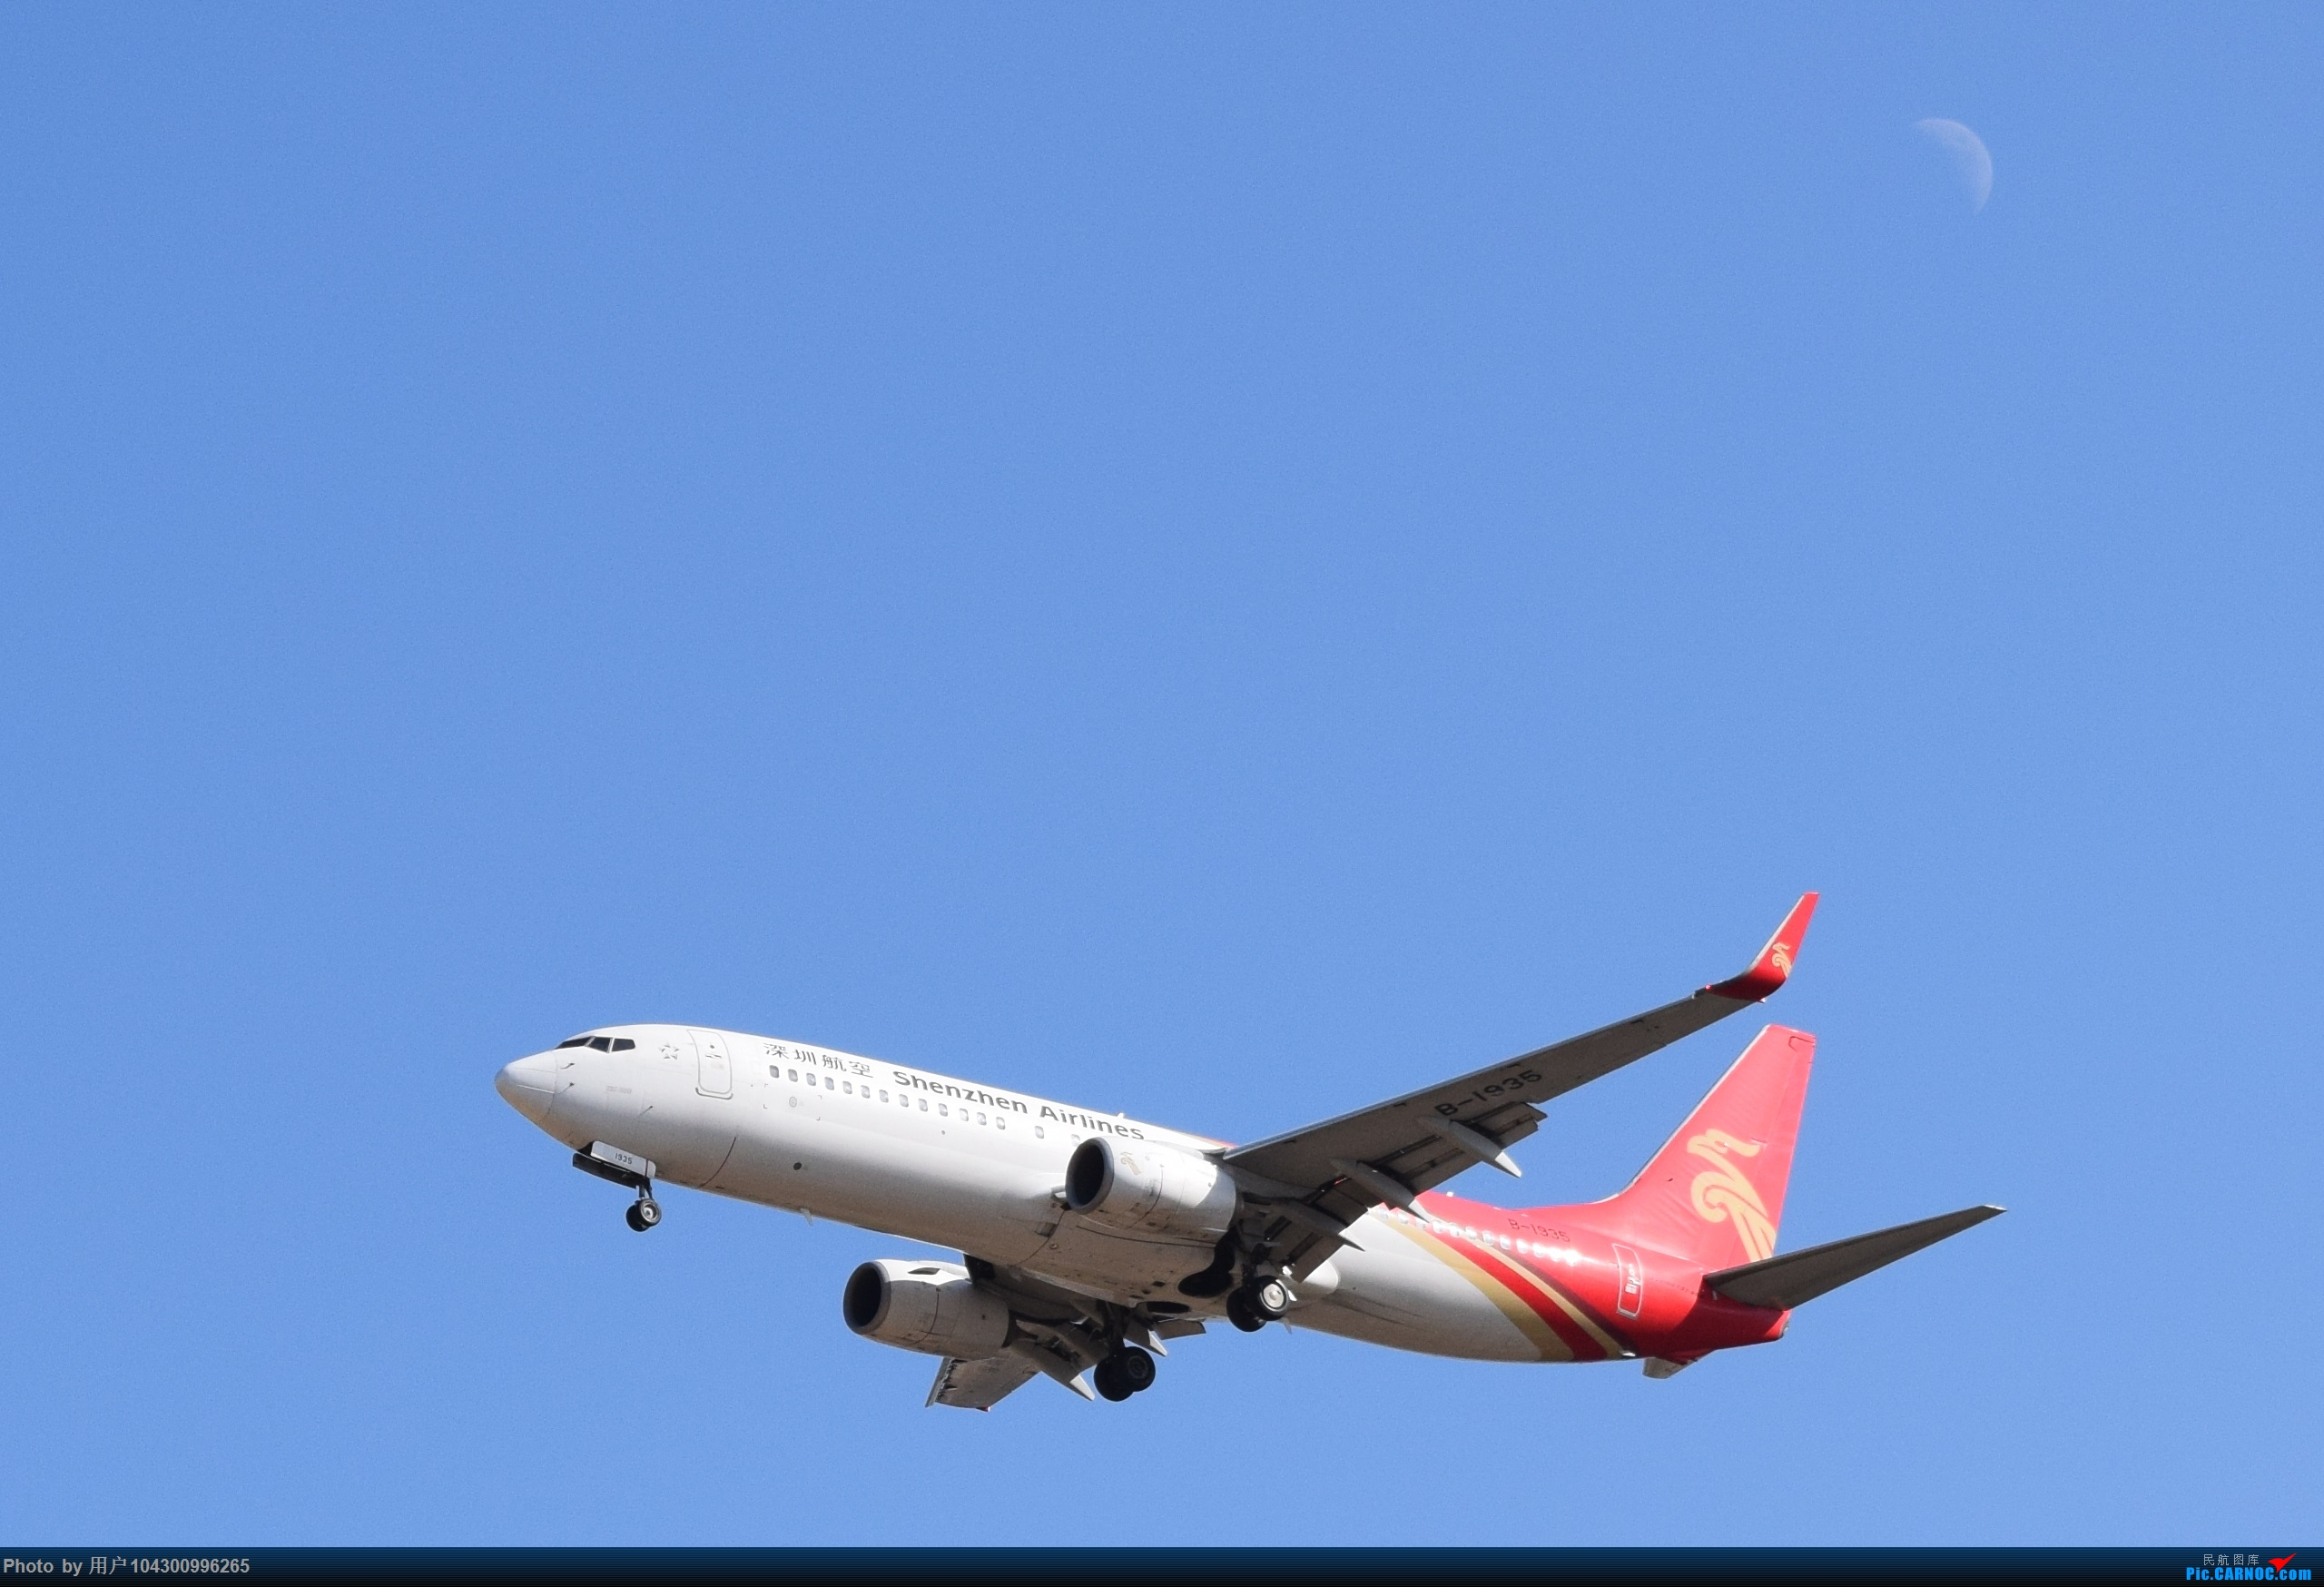 Re:[原创][KWE]贵阳今天天气不错,随便拍几张! BOEING 737-800 B-1935 中国贵阳龙洞堡国际机场